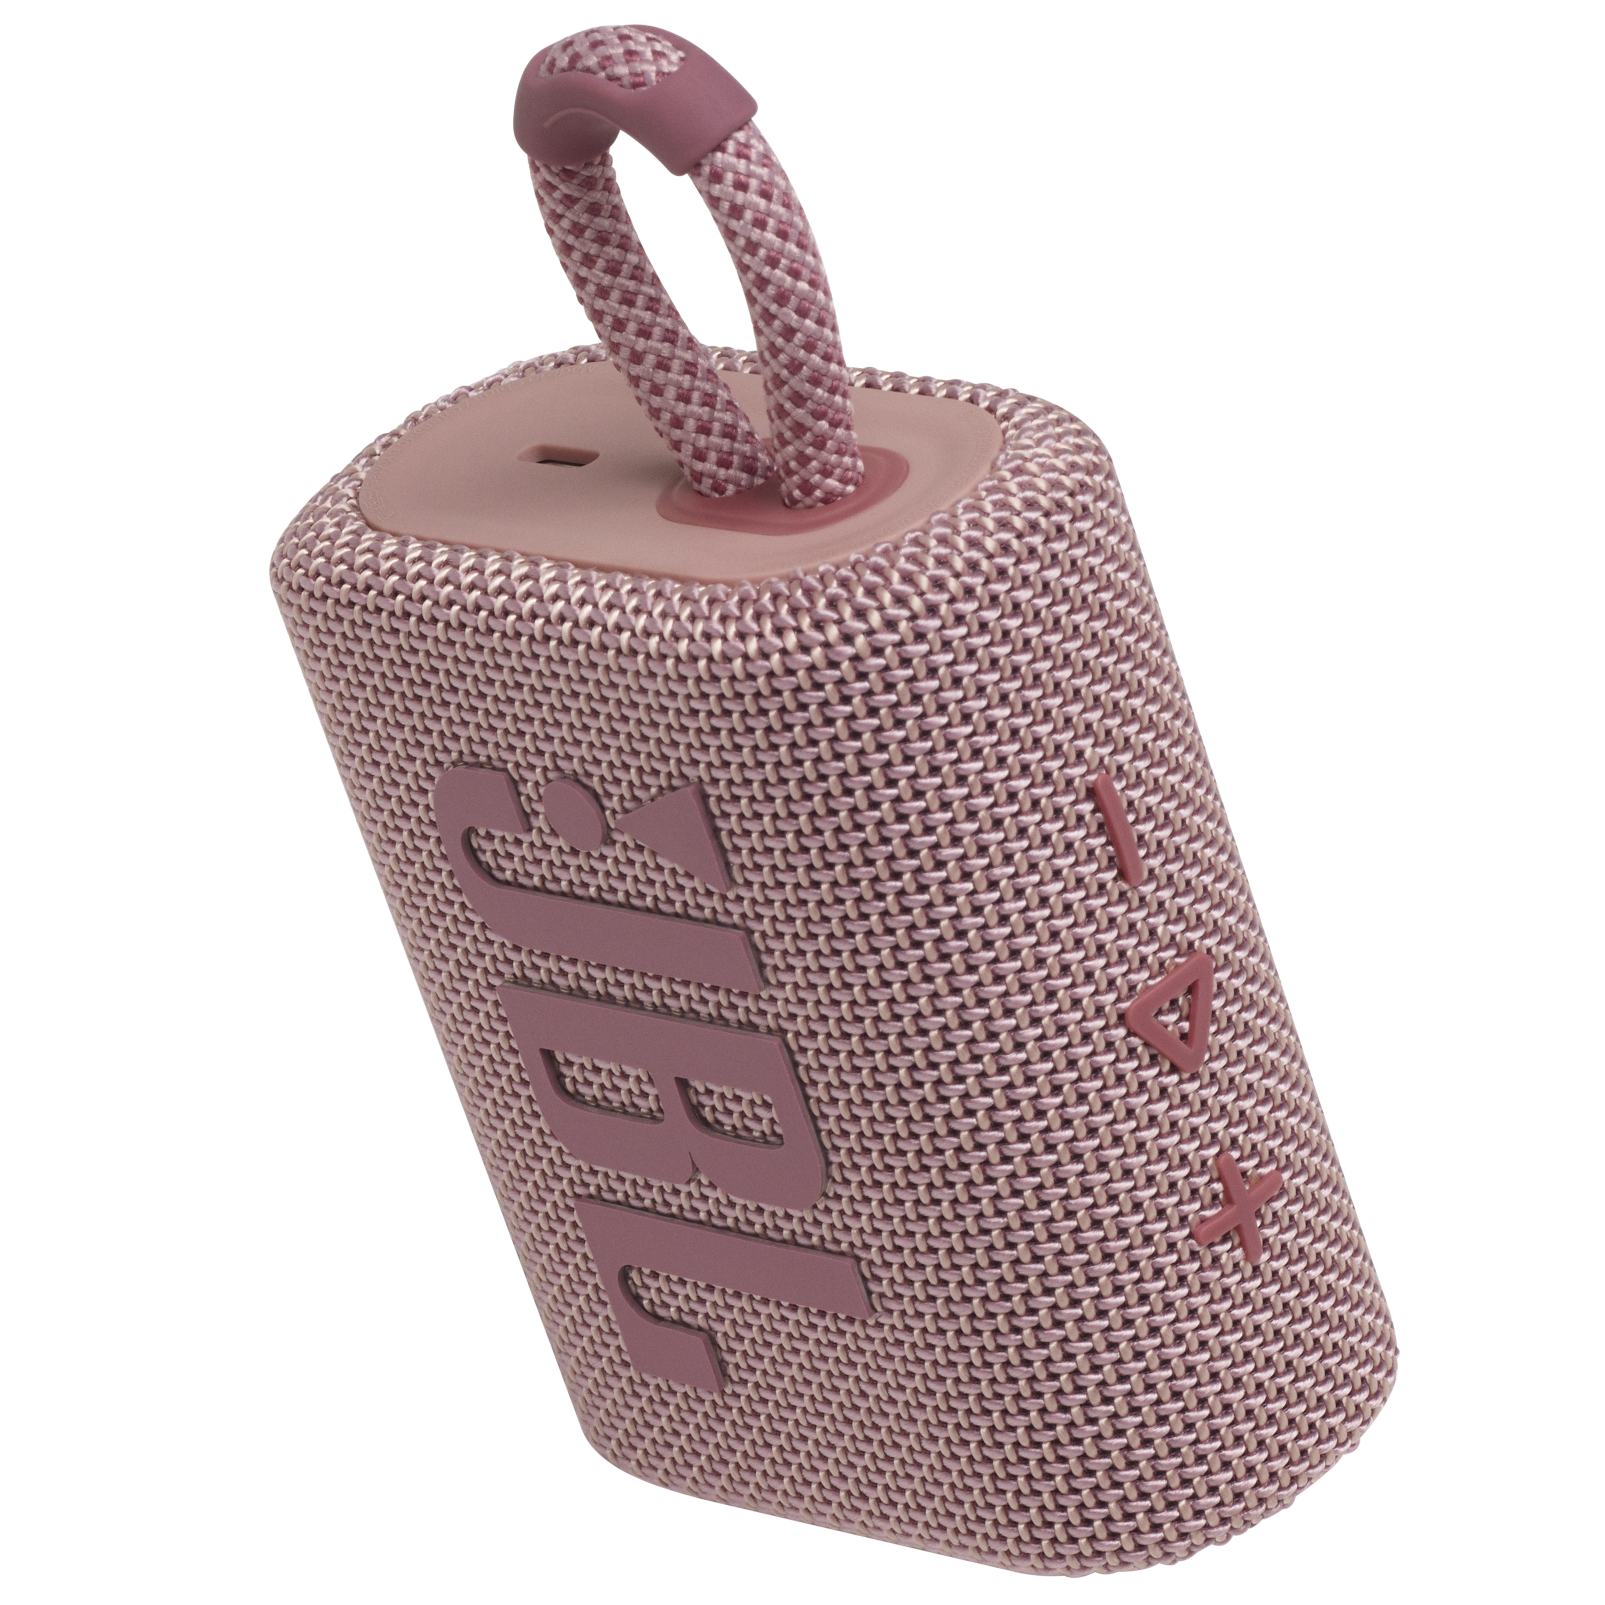 JBL GO 3 - Pink - Portable Waterproof Speaker - Detailshot 2